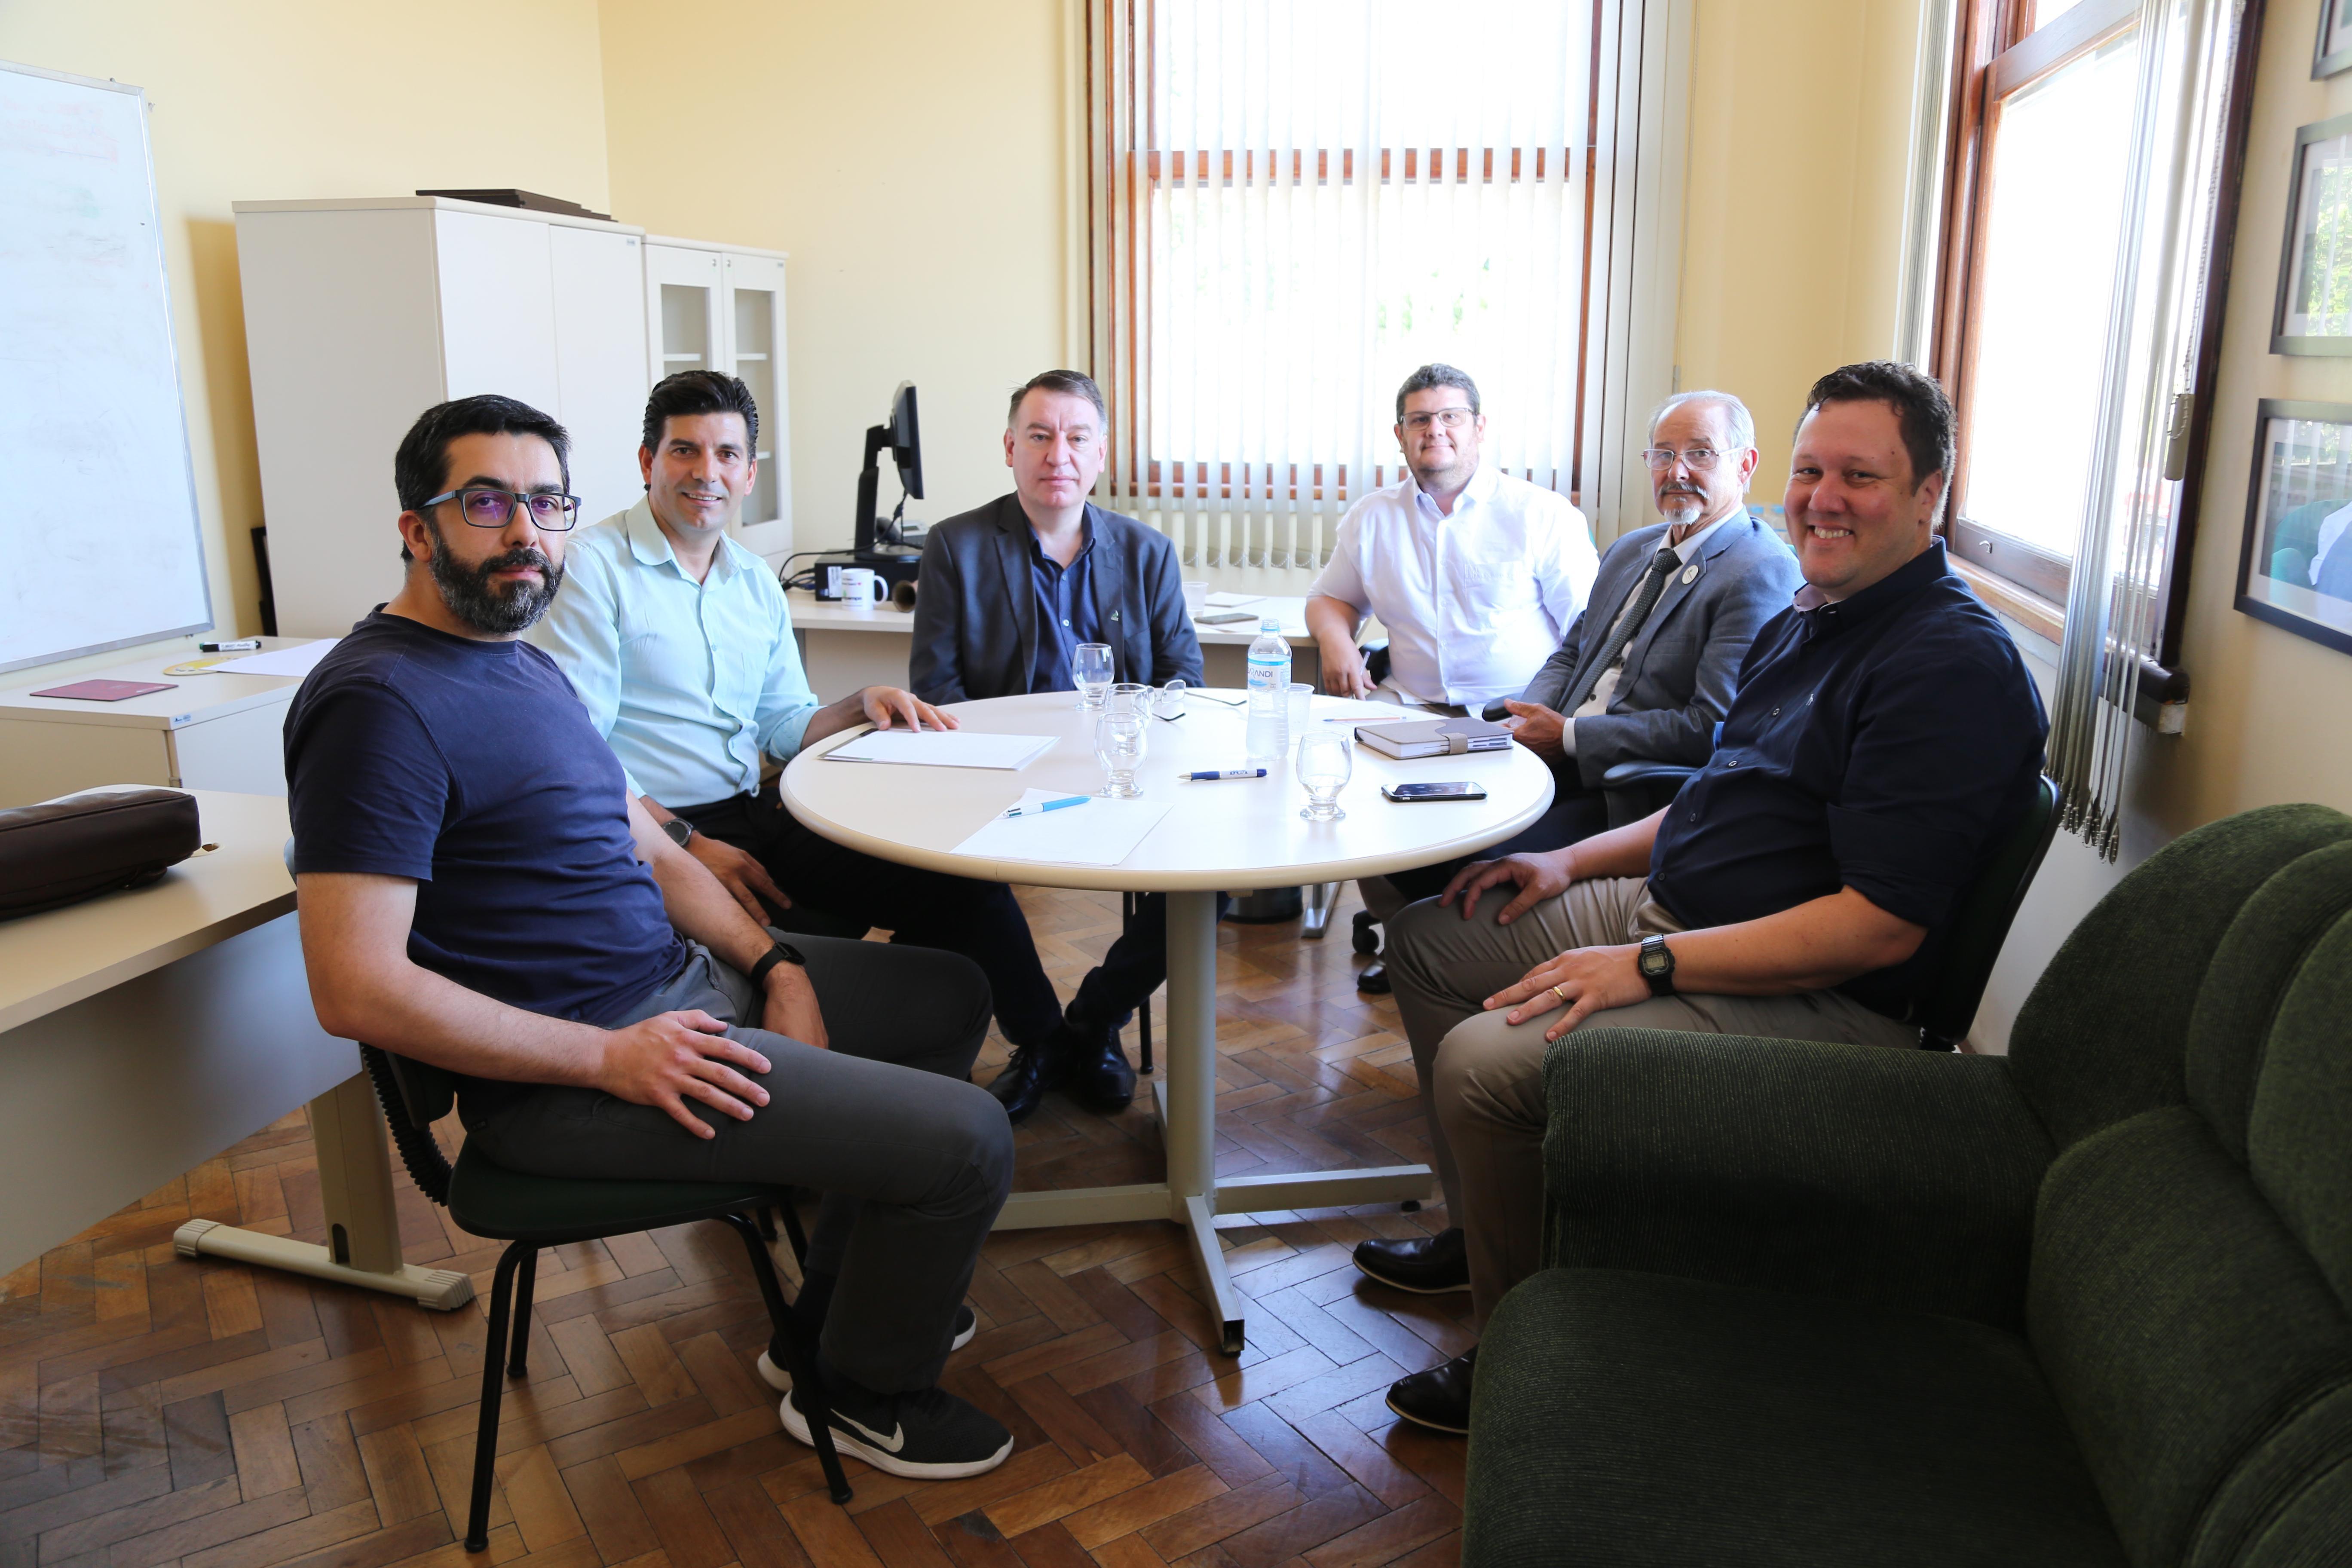 Reunião entre a UFFS e a DTIC da Unipampa - Foto: Franceli Couto/Unipampa